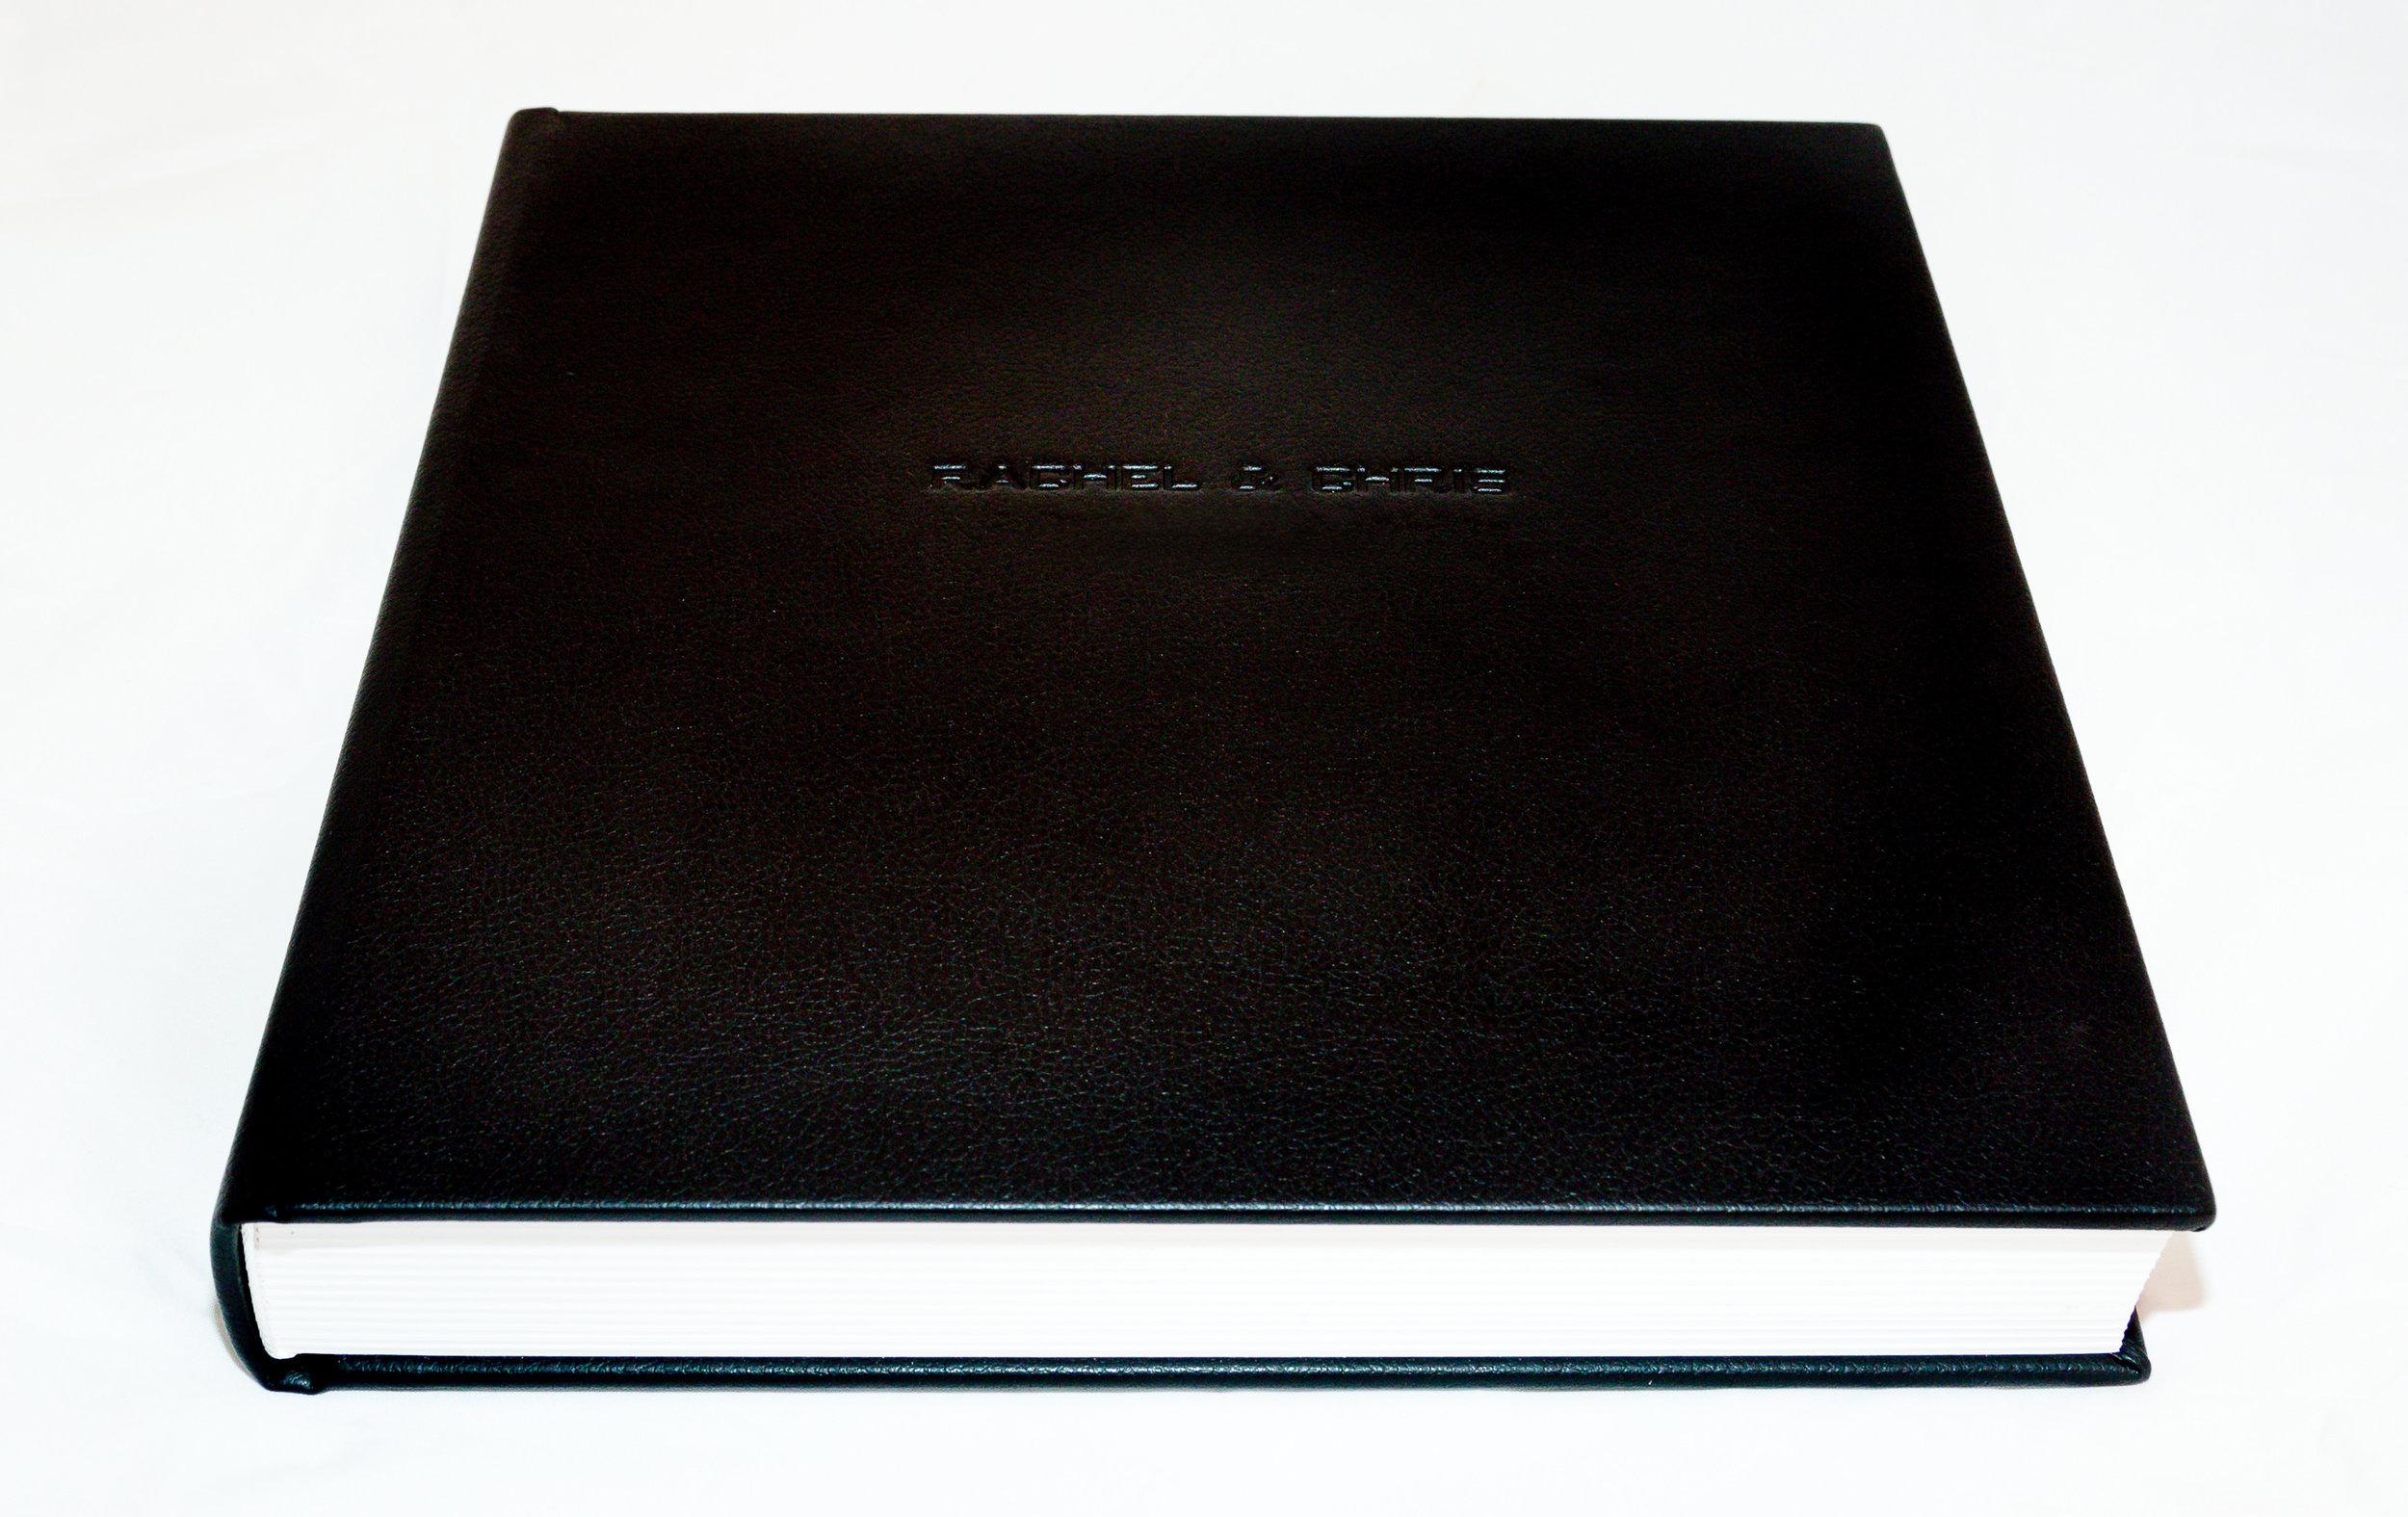 overlay-matted-album-09-new.jpg